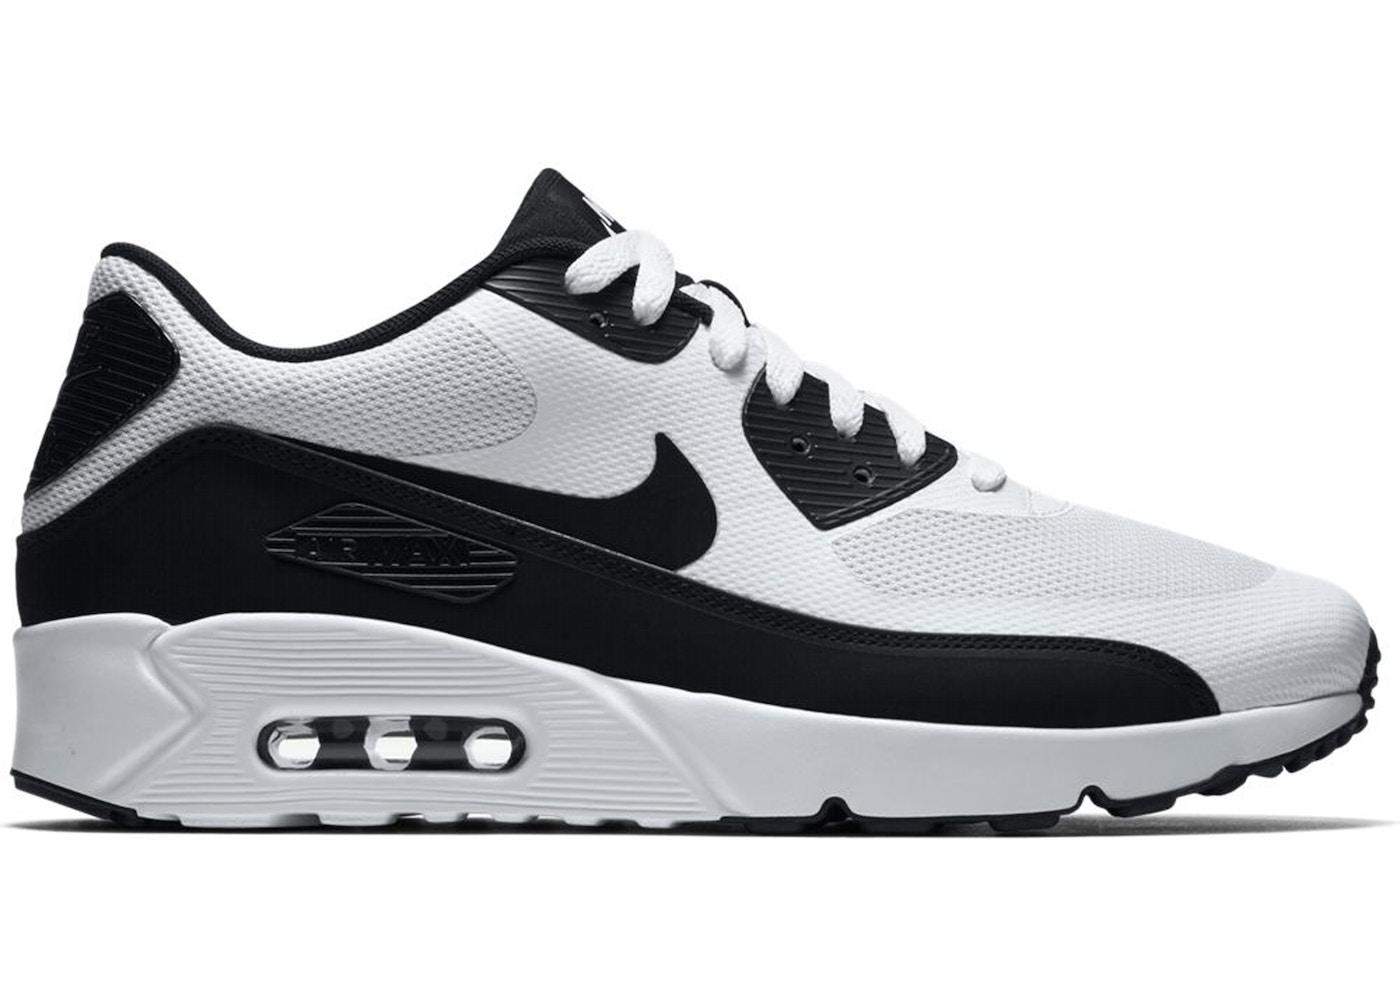 Nike Air Max 90 Ultra 2.0 White Black - 875695-100